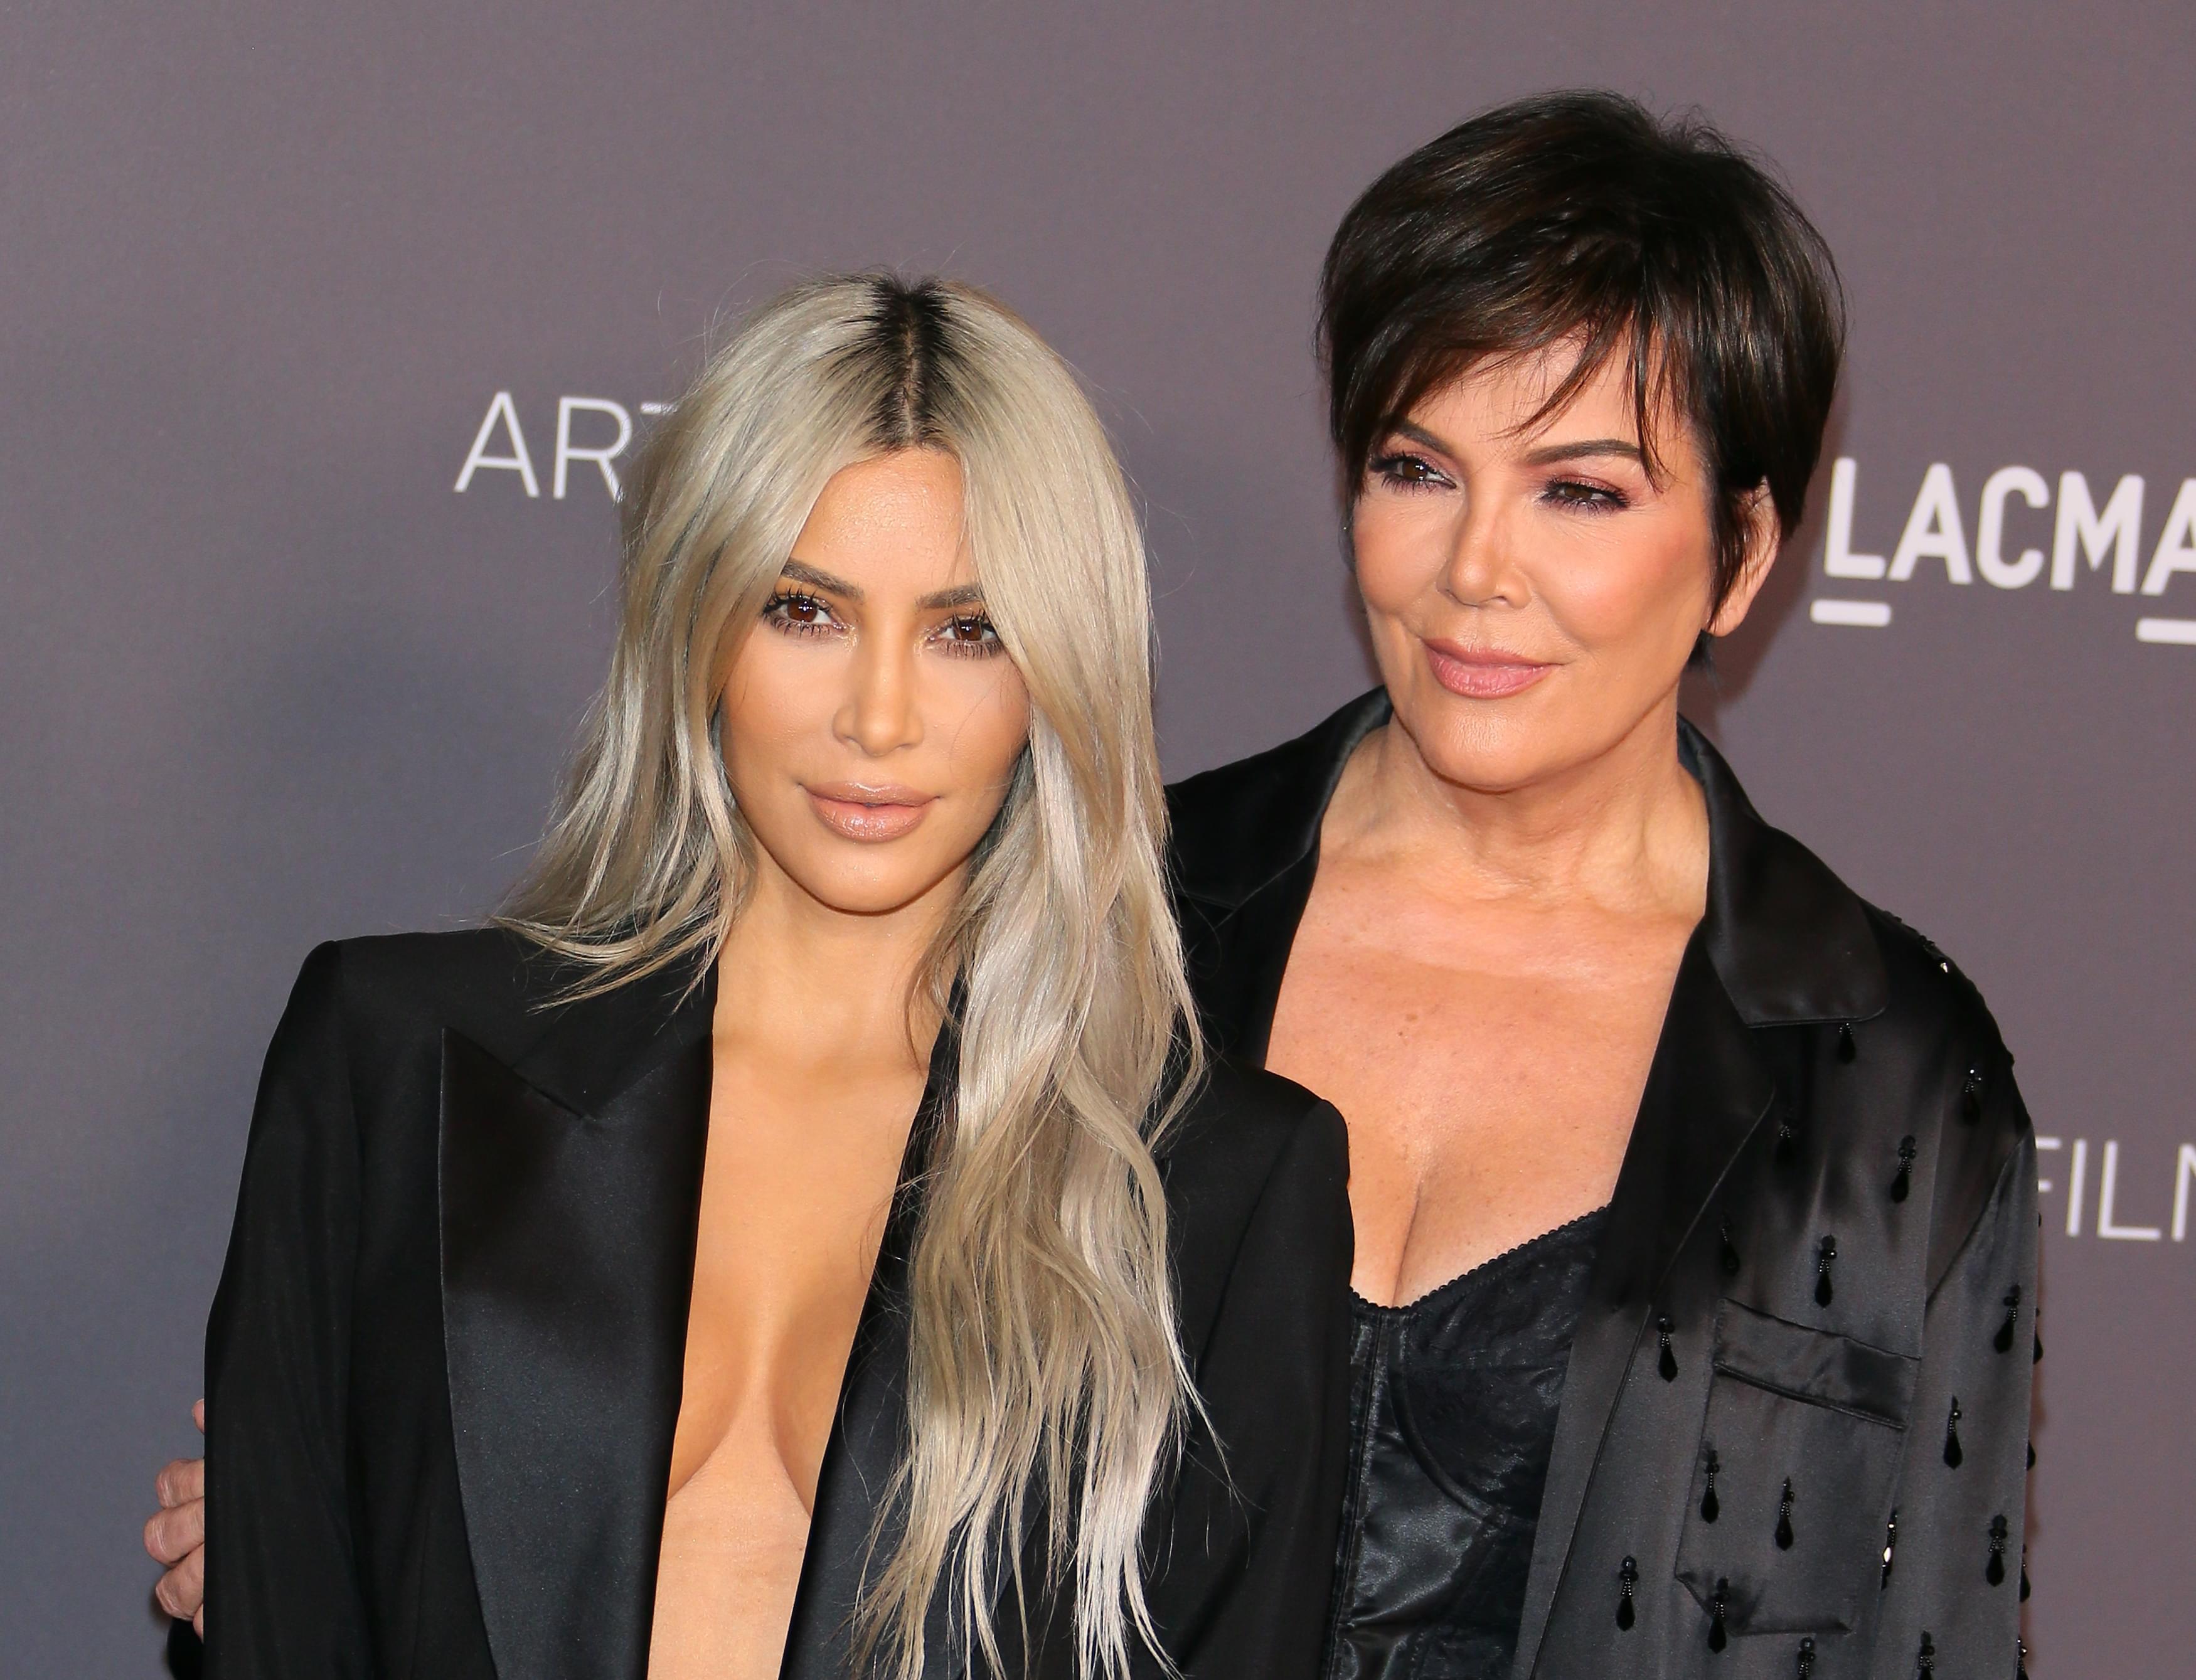 Kardashians Take Over Family Feud